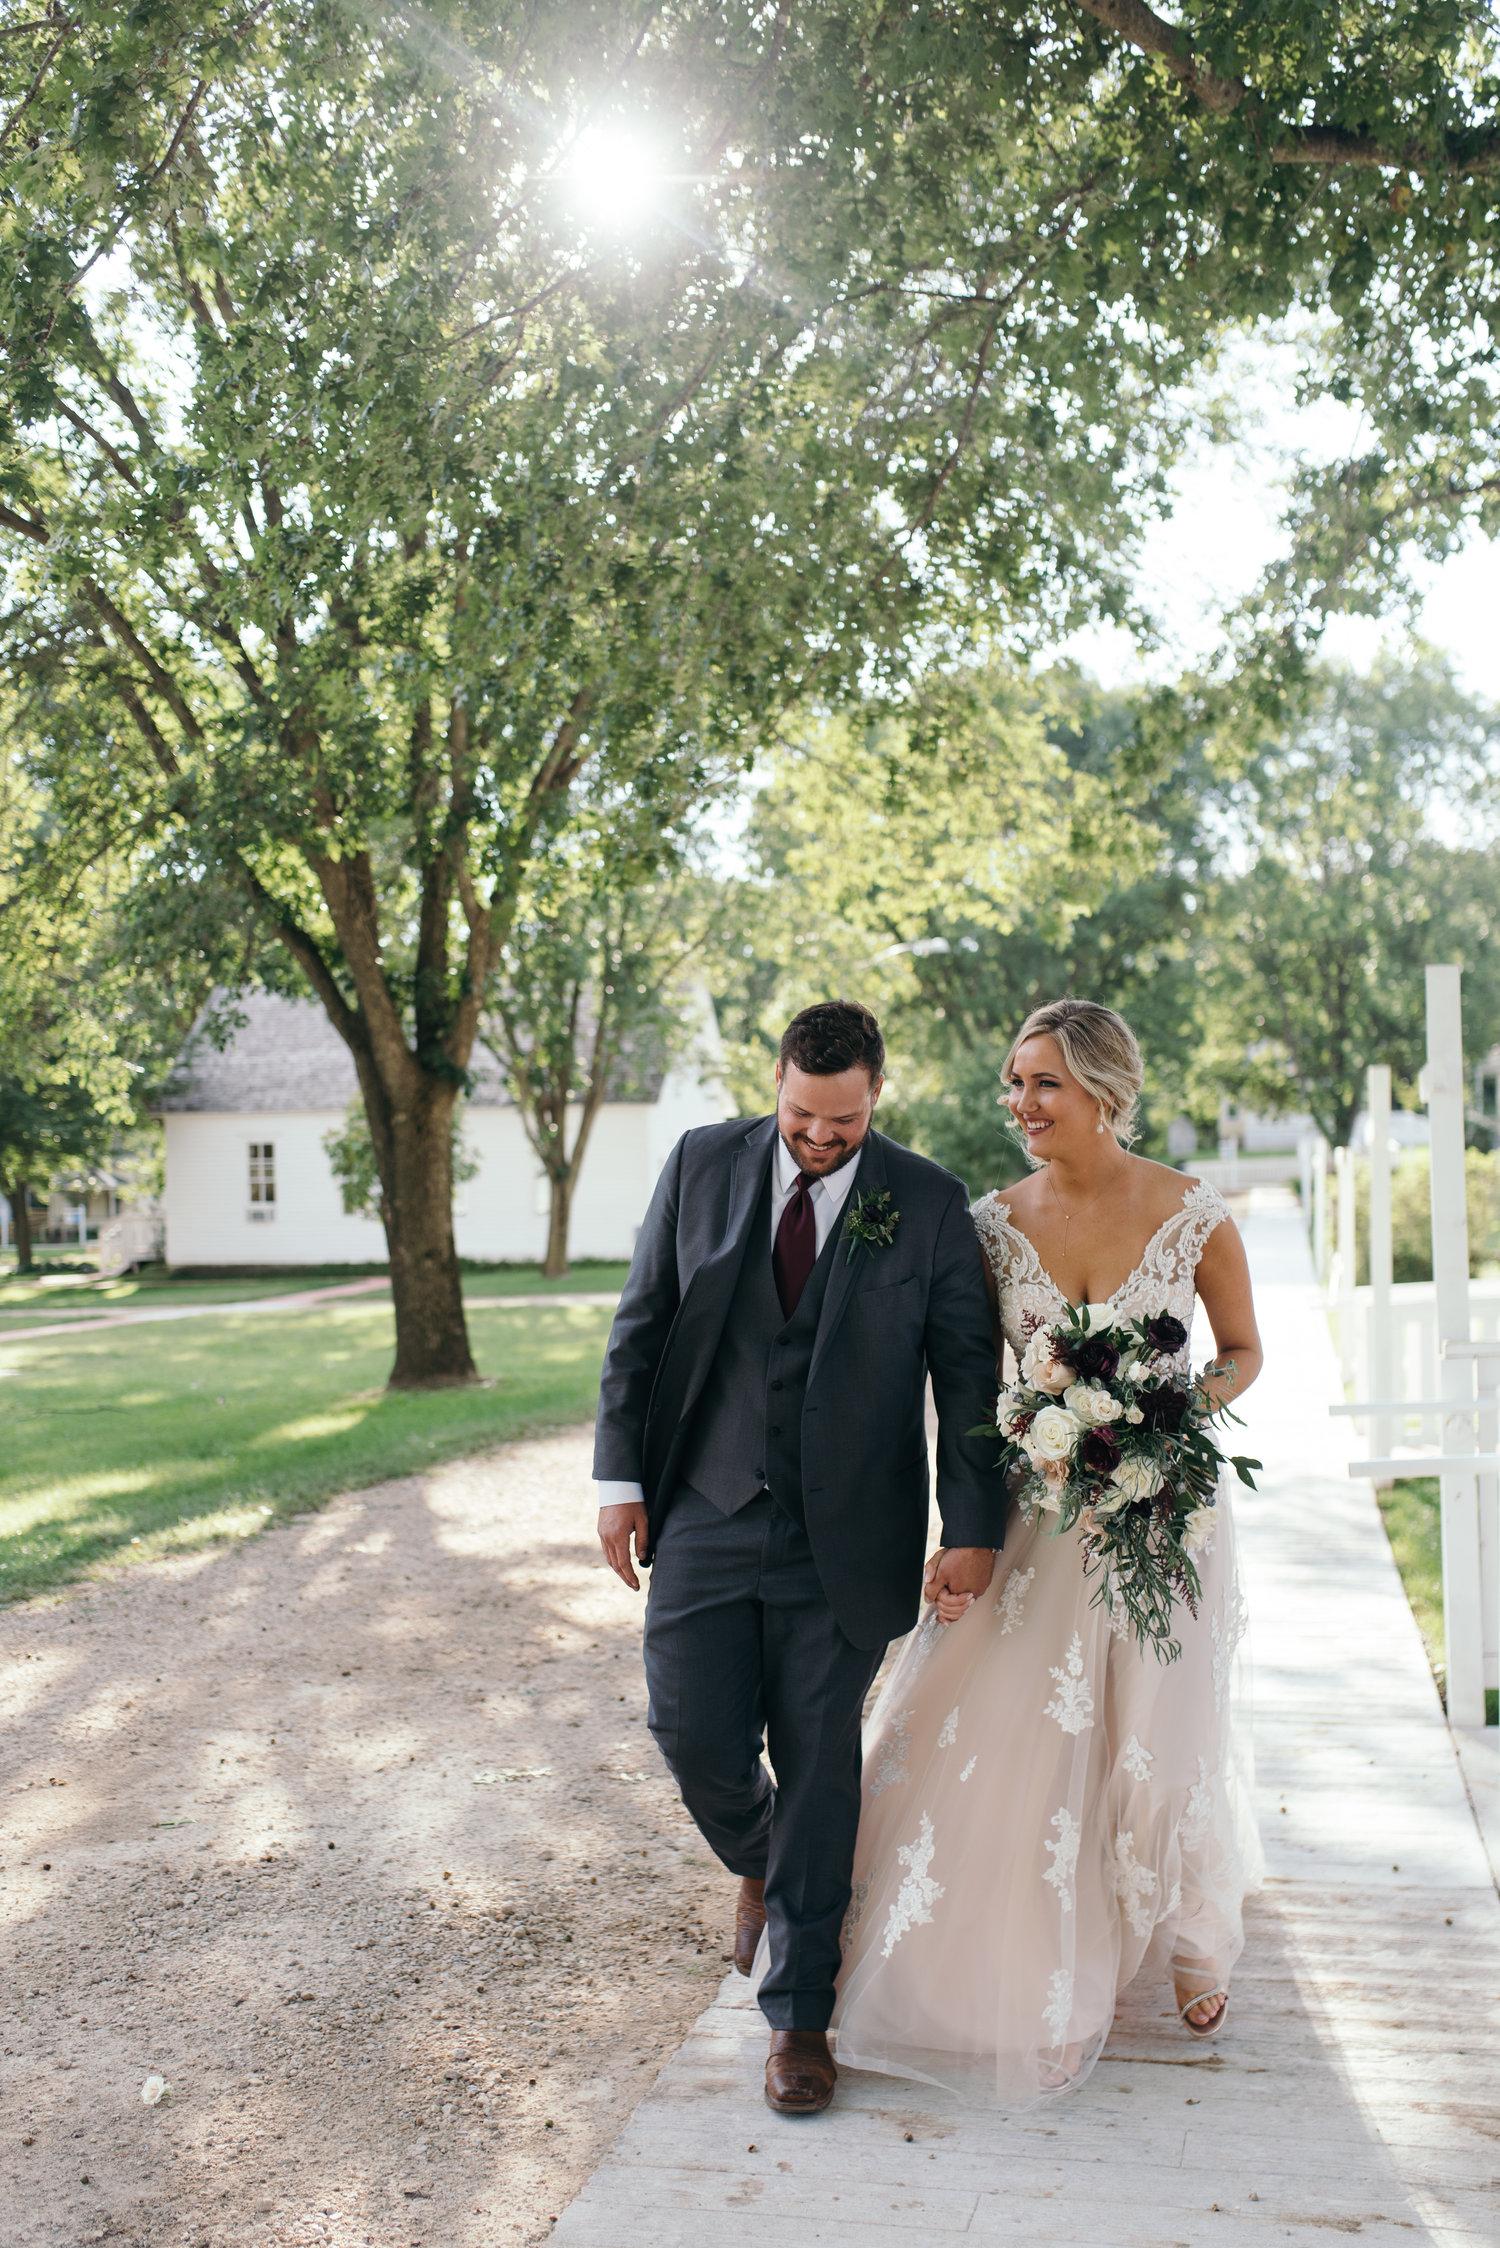 bride and groom walking Ushers Ferry Historic Village wedding venue sunset